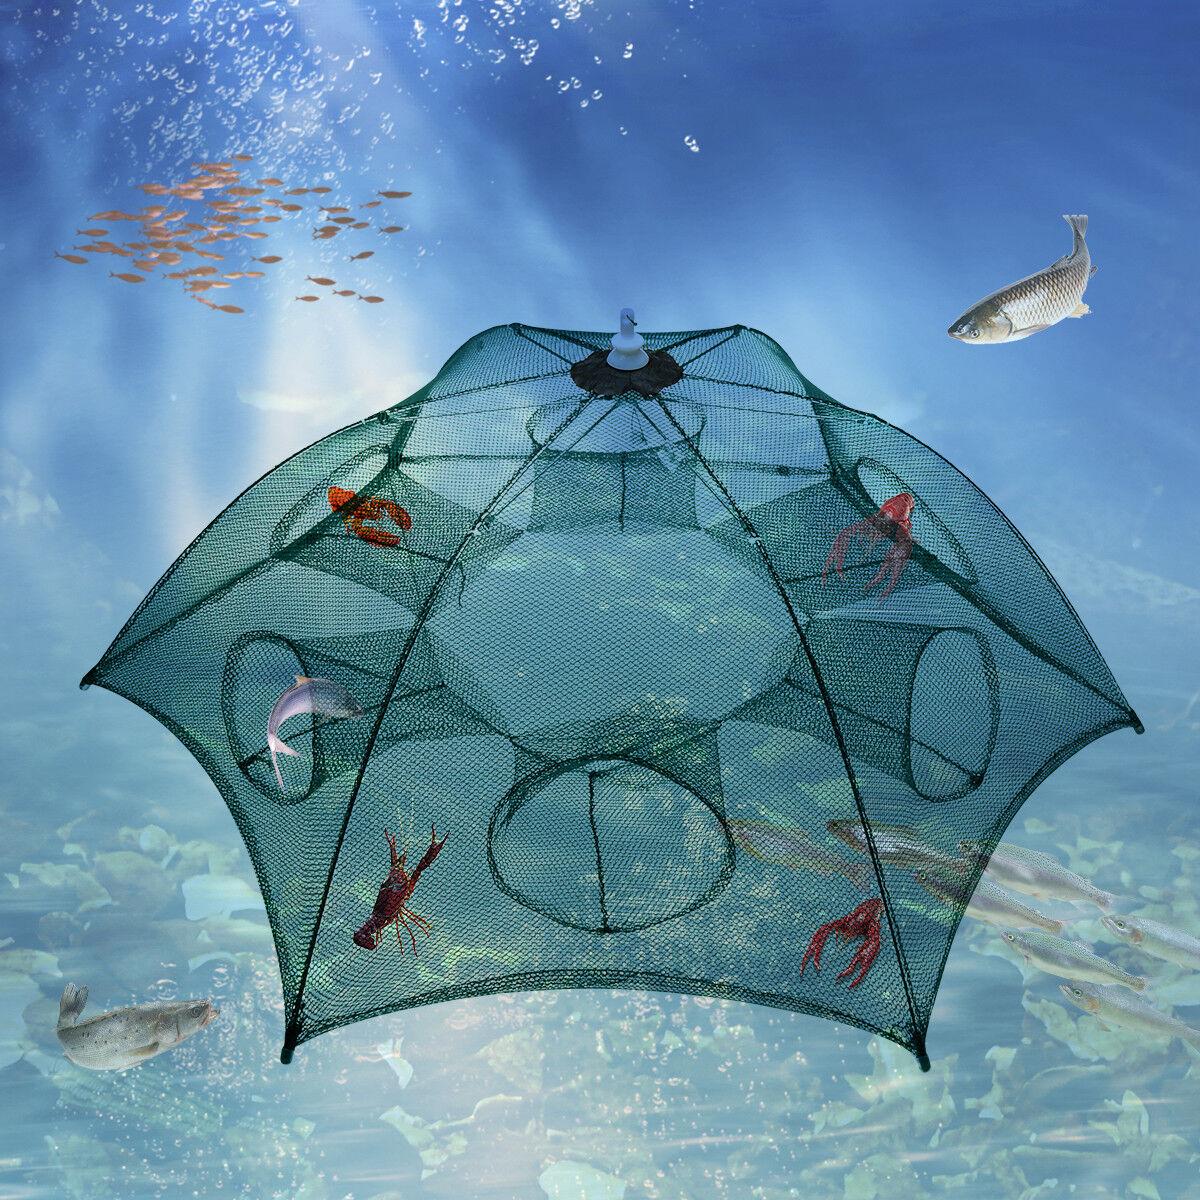 Crawdad Shrimp Cast Dip Cage Fish Minnow Foldable Fishing Trap Net Crab K6Q2